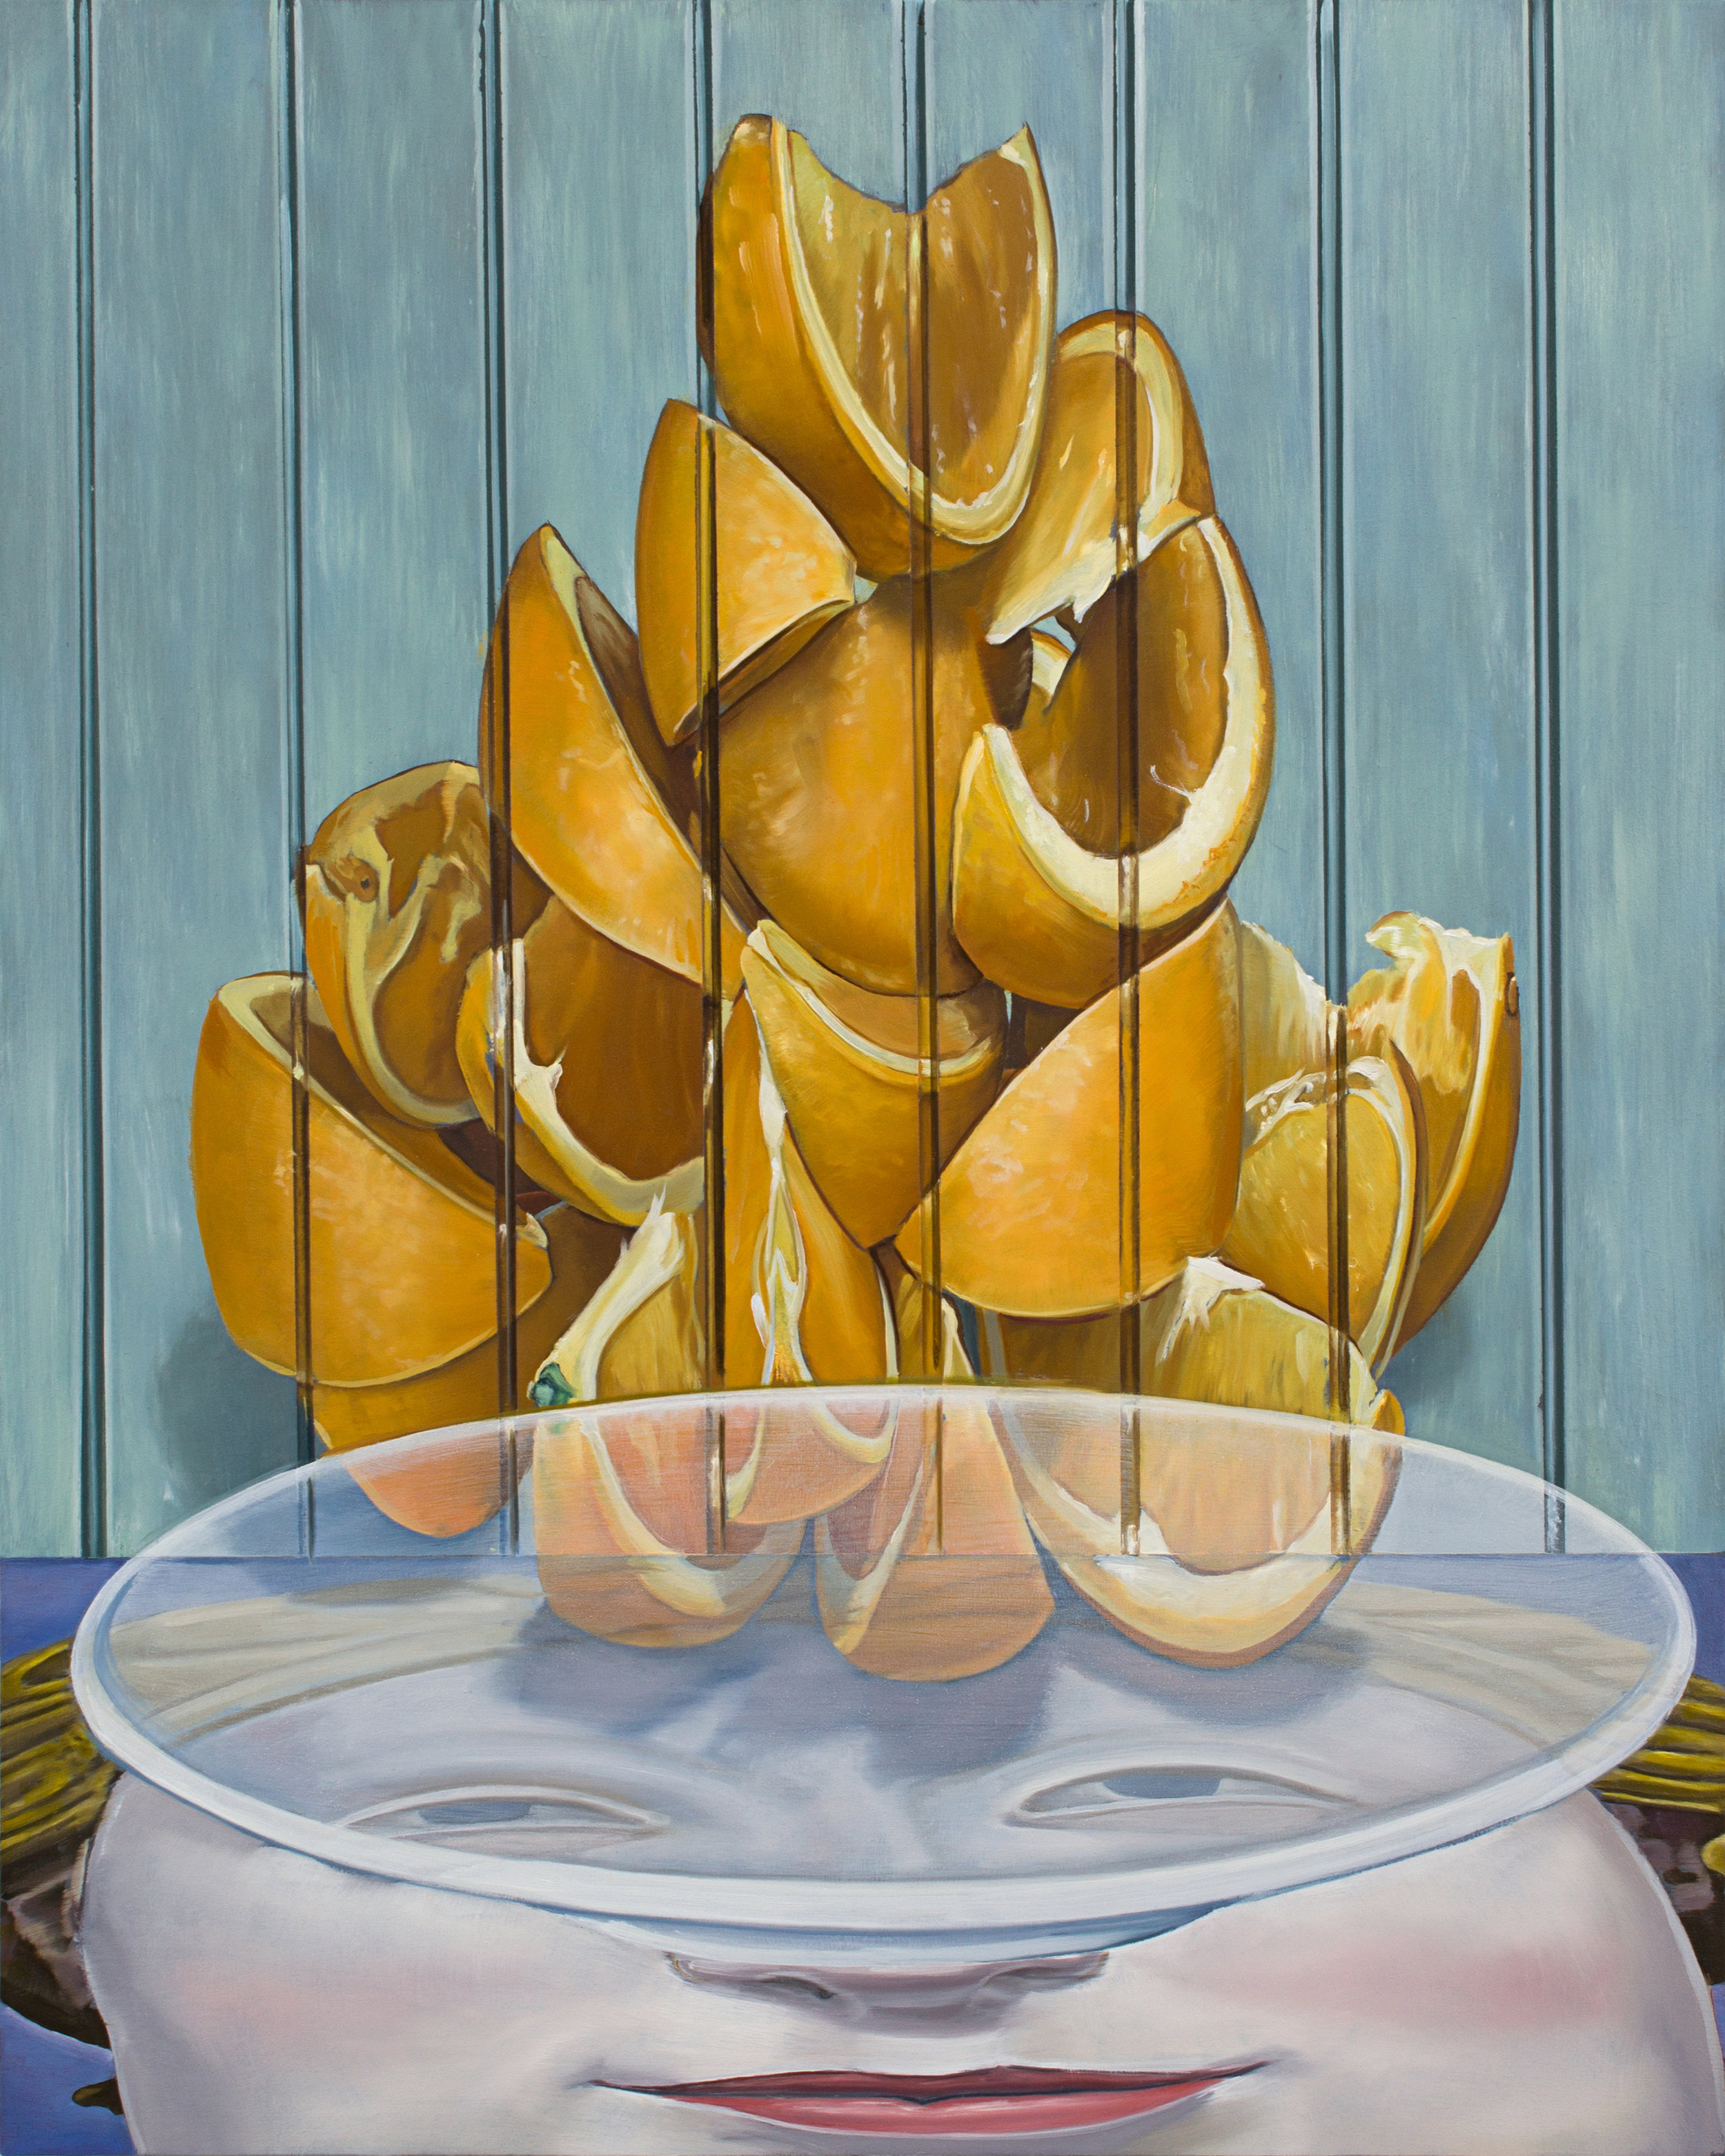 Orange Trip for Méliès,  2018. Oil on panel, 20 x 16 inches